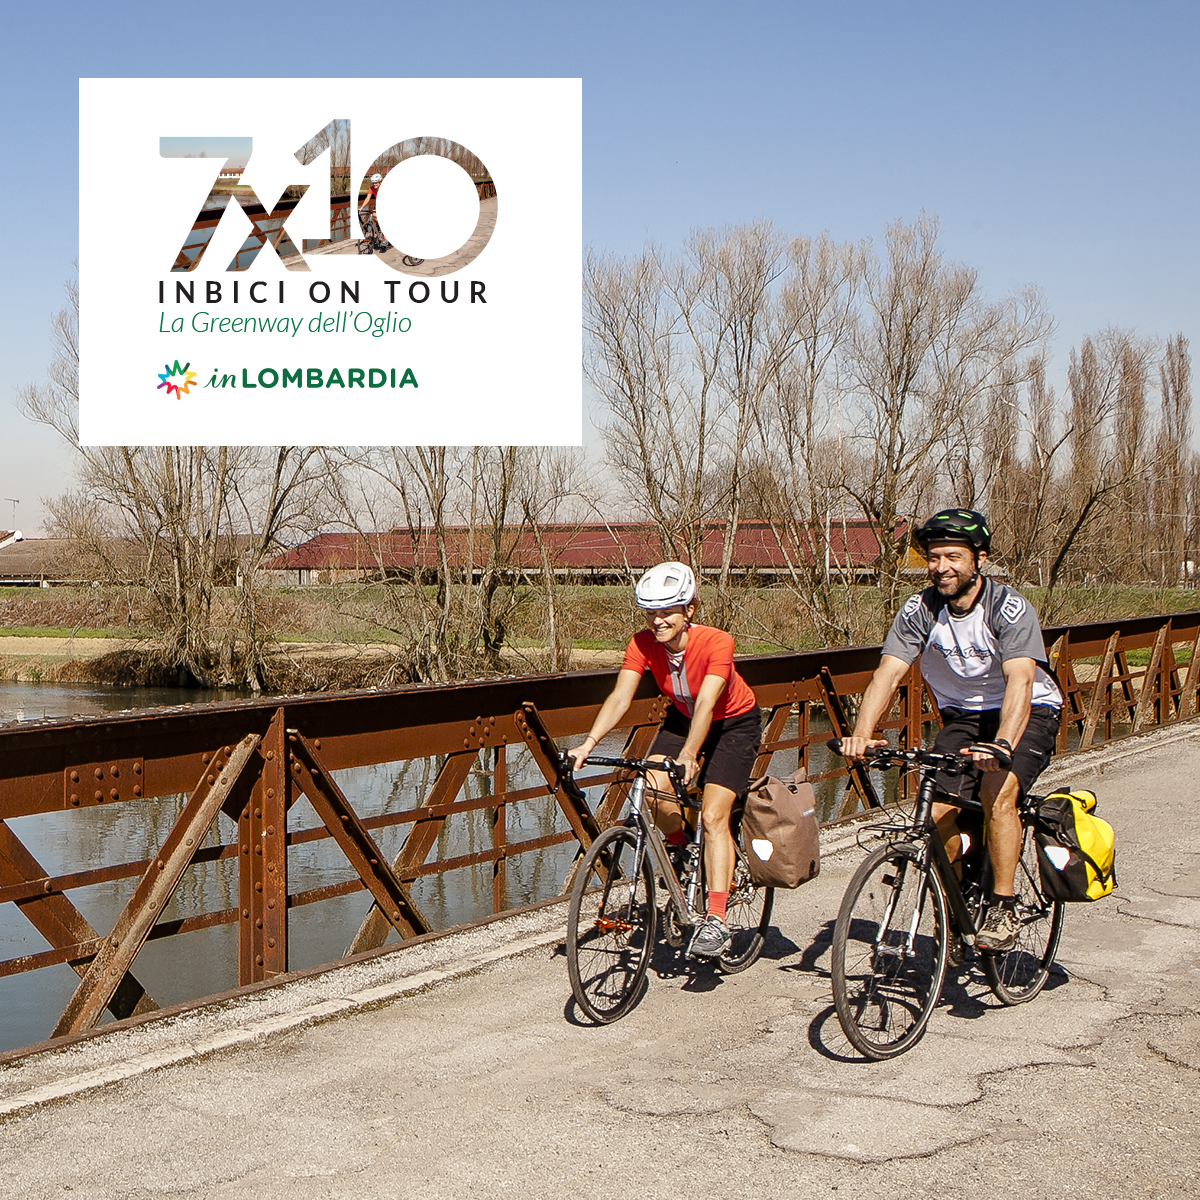 Cicloturismo in Lombardia